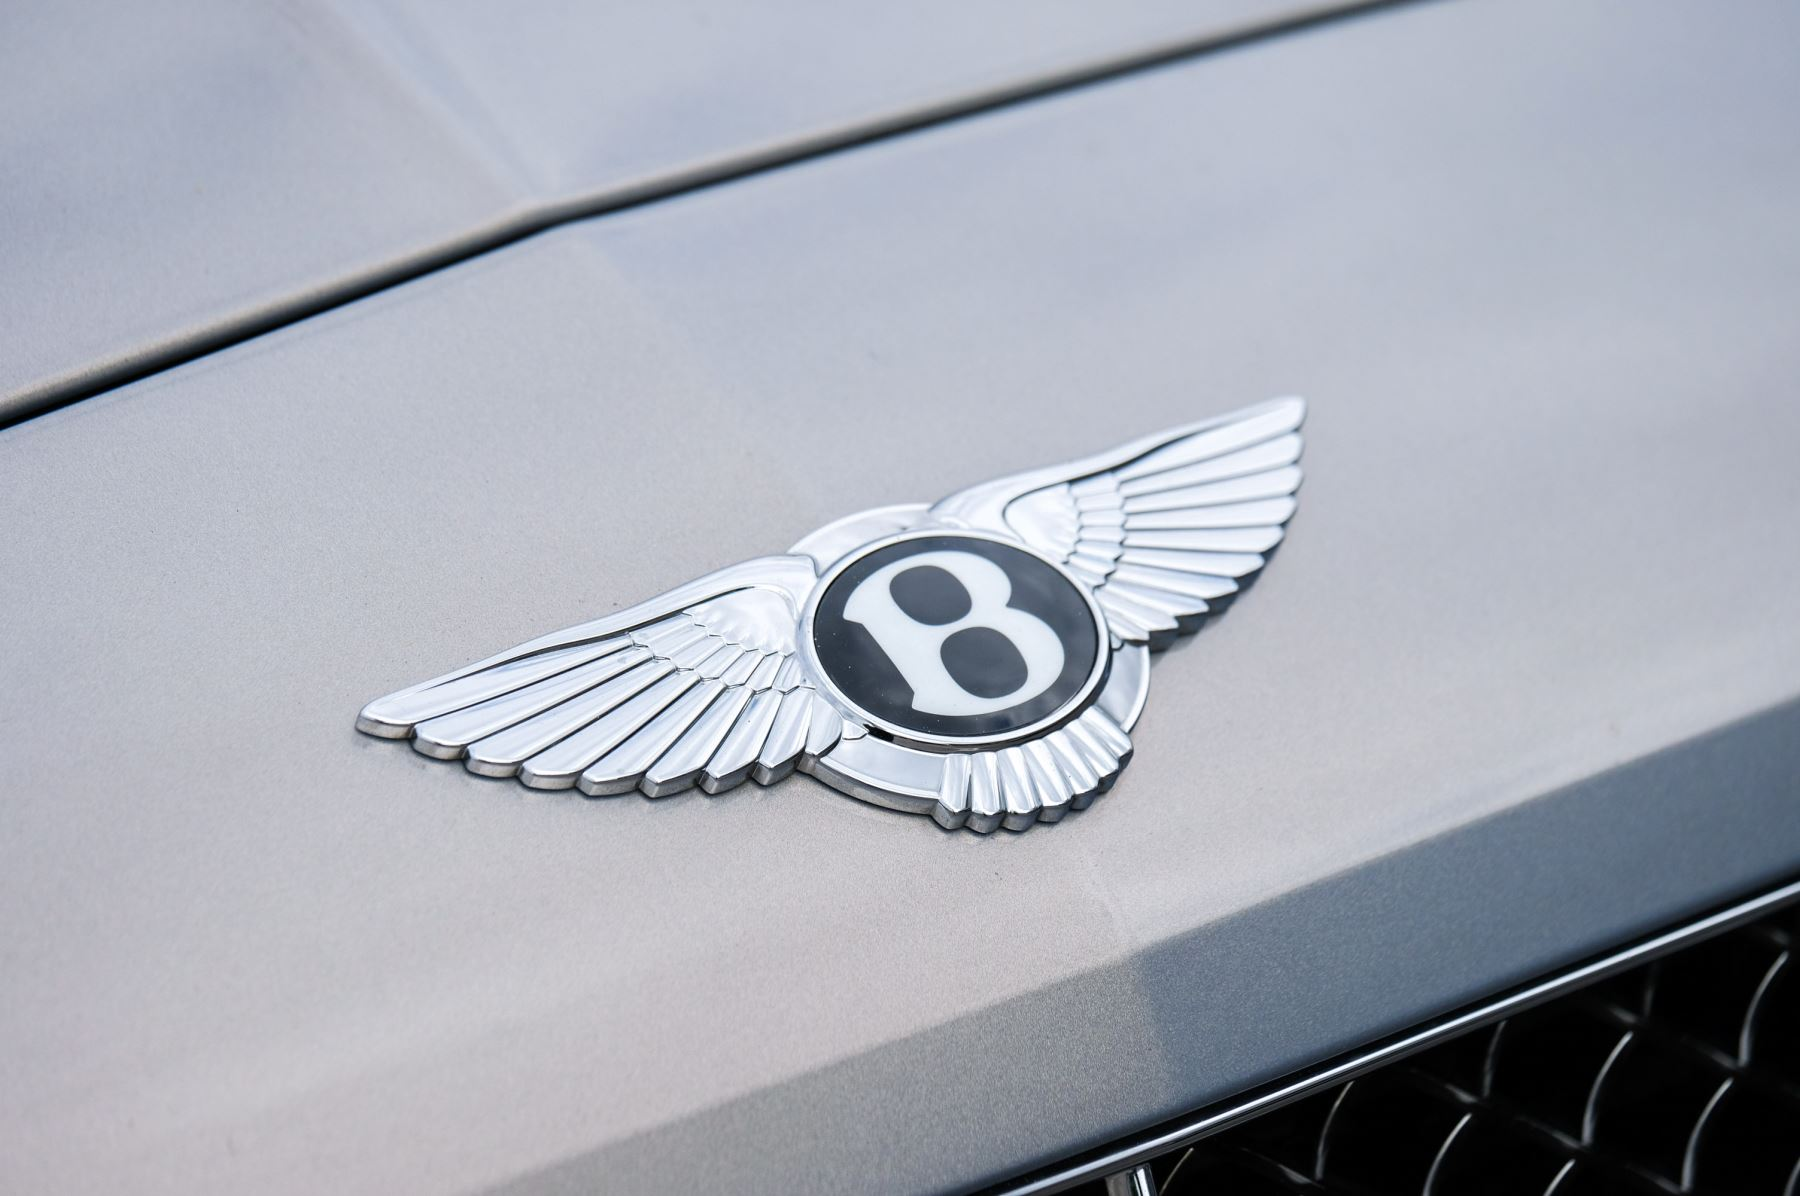 Bentley Continental GT 6.0 W12 [635] Speed - Premier Specification - Carbon Fibre Fascia Panels image 8